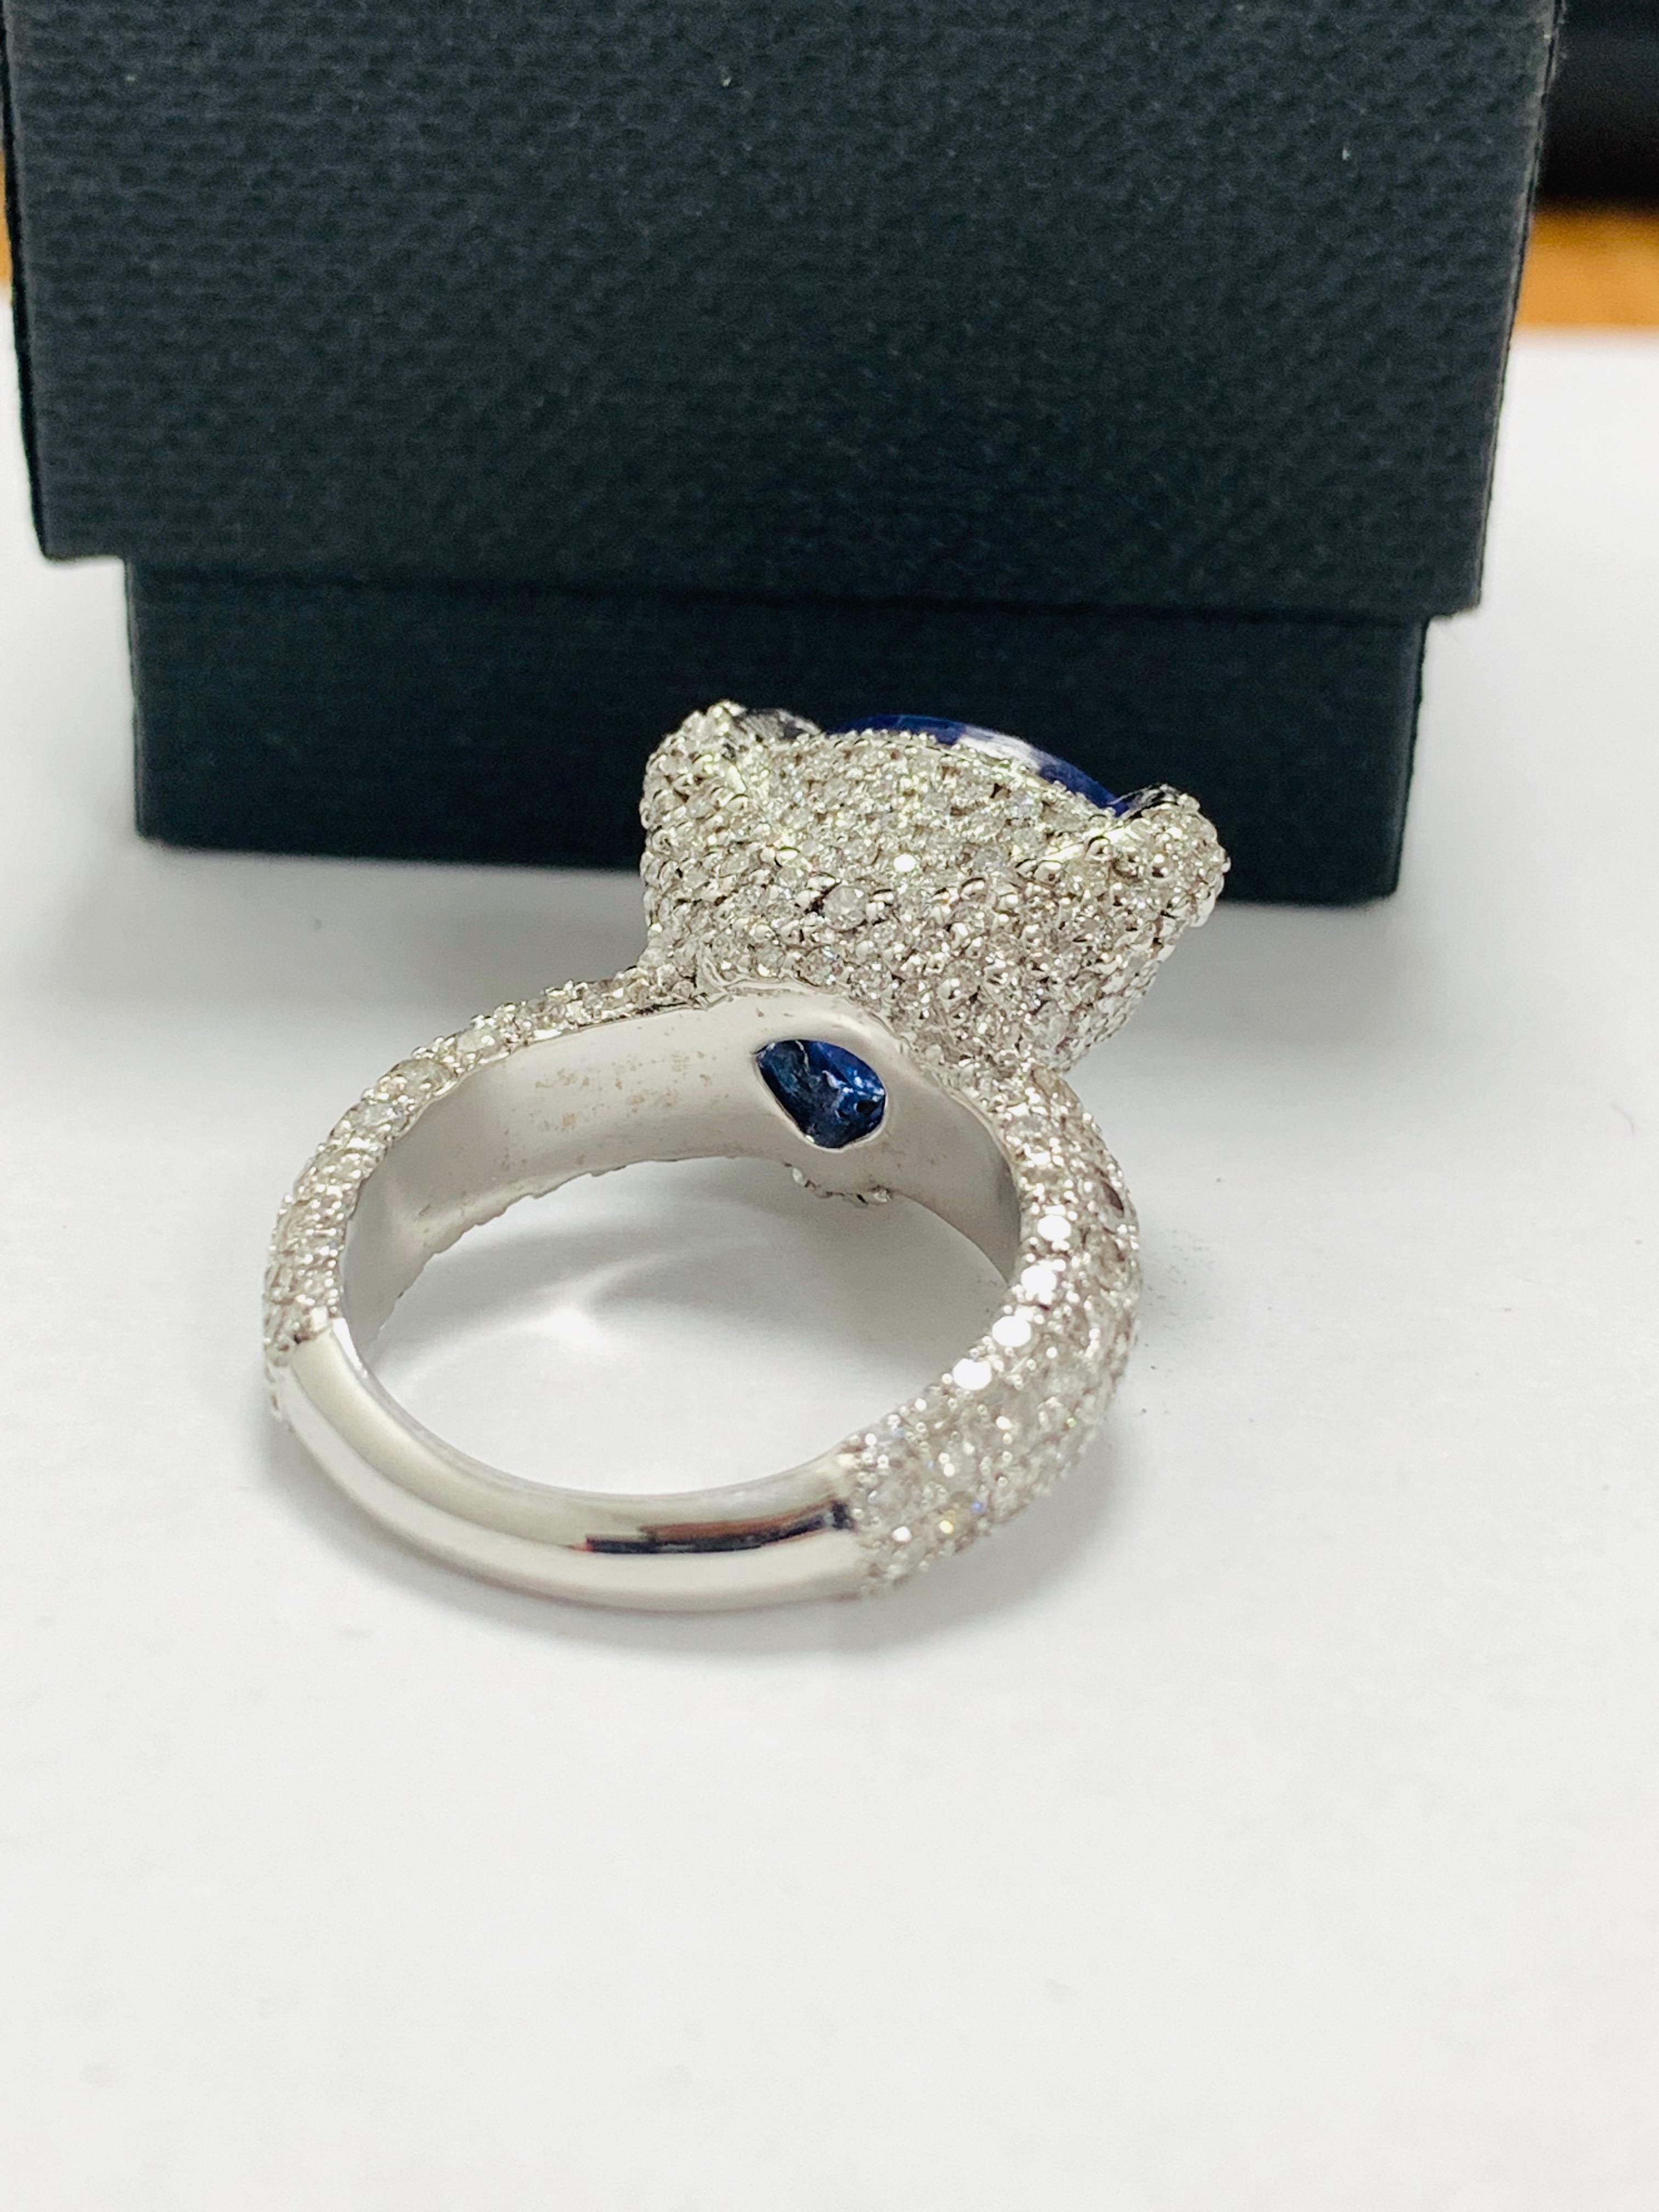 platinum tanzanite ring - Image 7 of 13